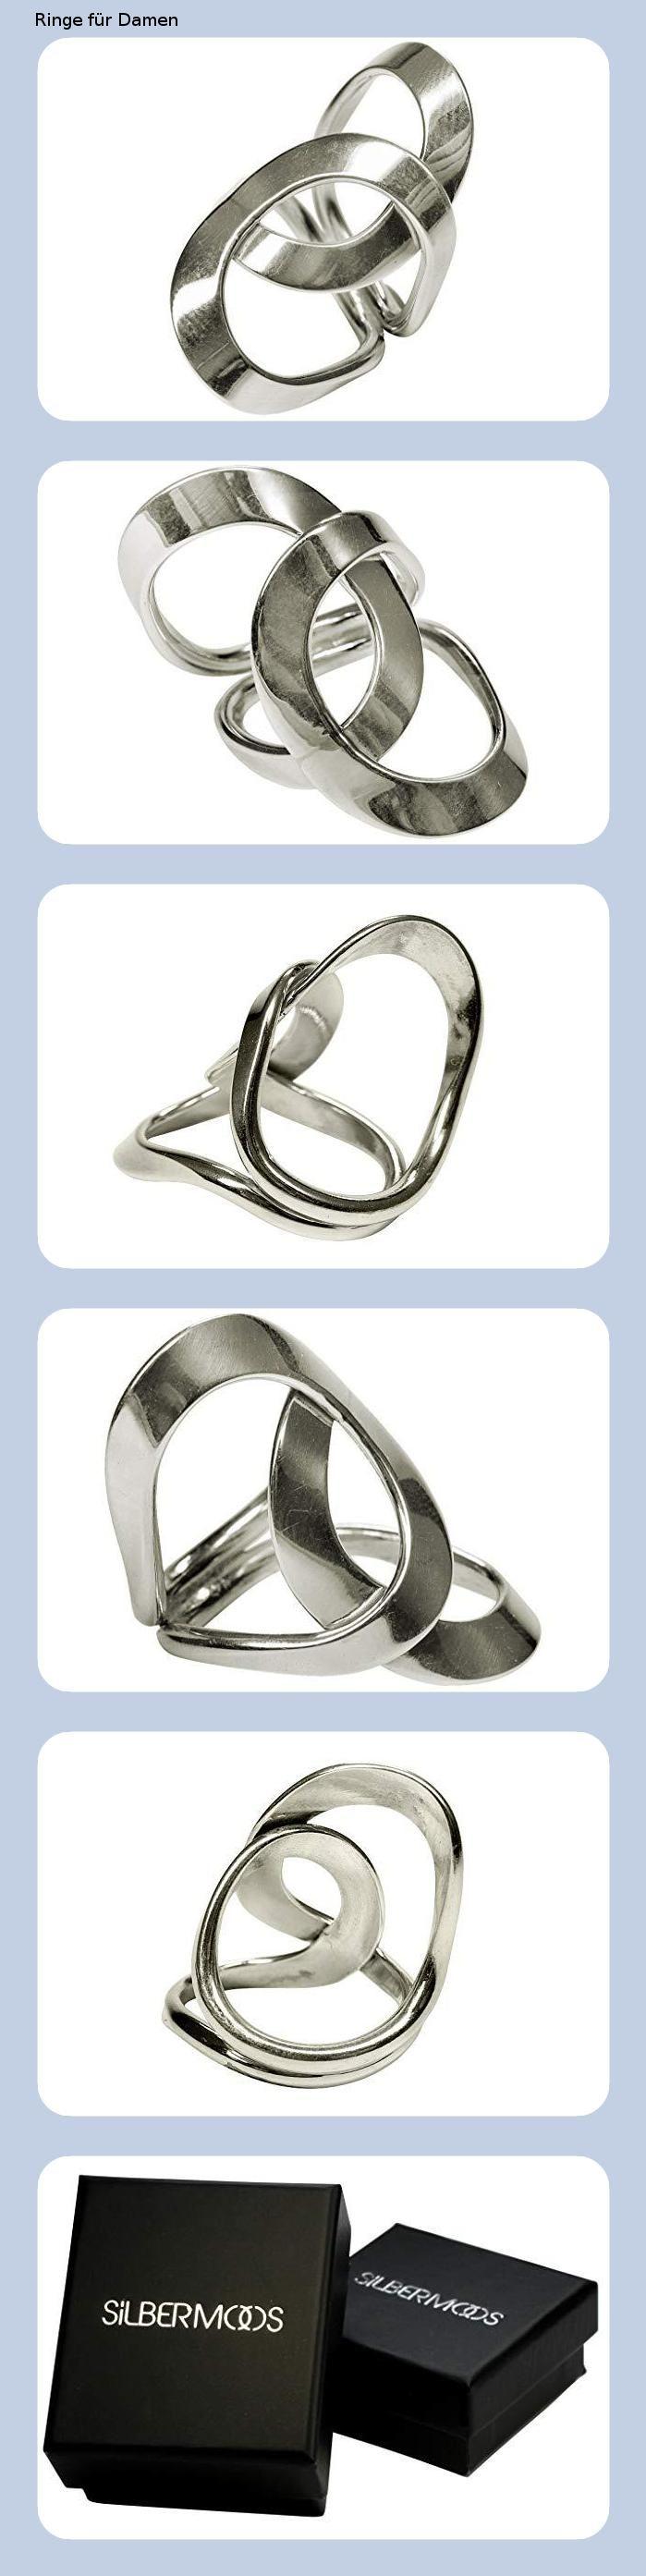 SILBERMOOS XL Ring Damen Verlobung Breit Dreierring 925 Sterling Silber